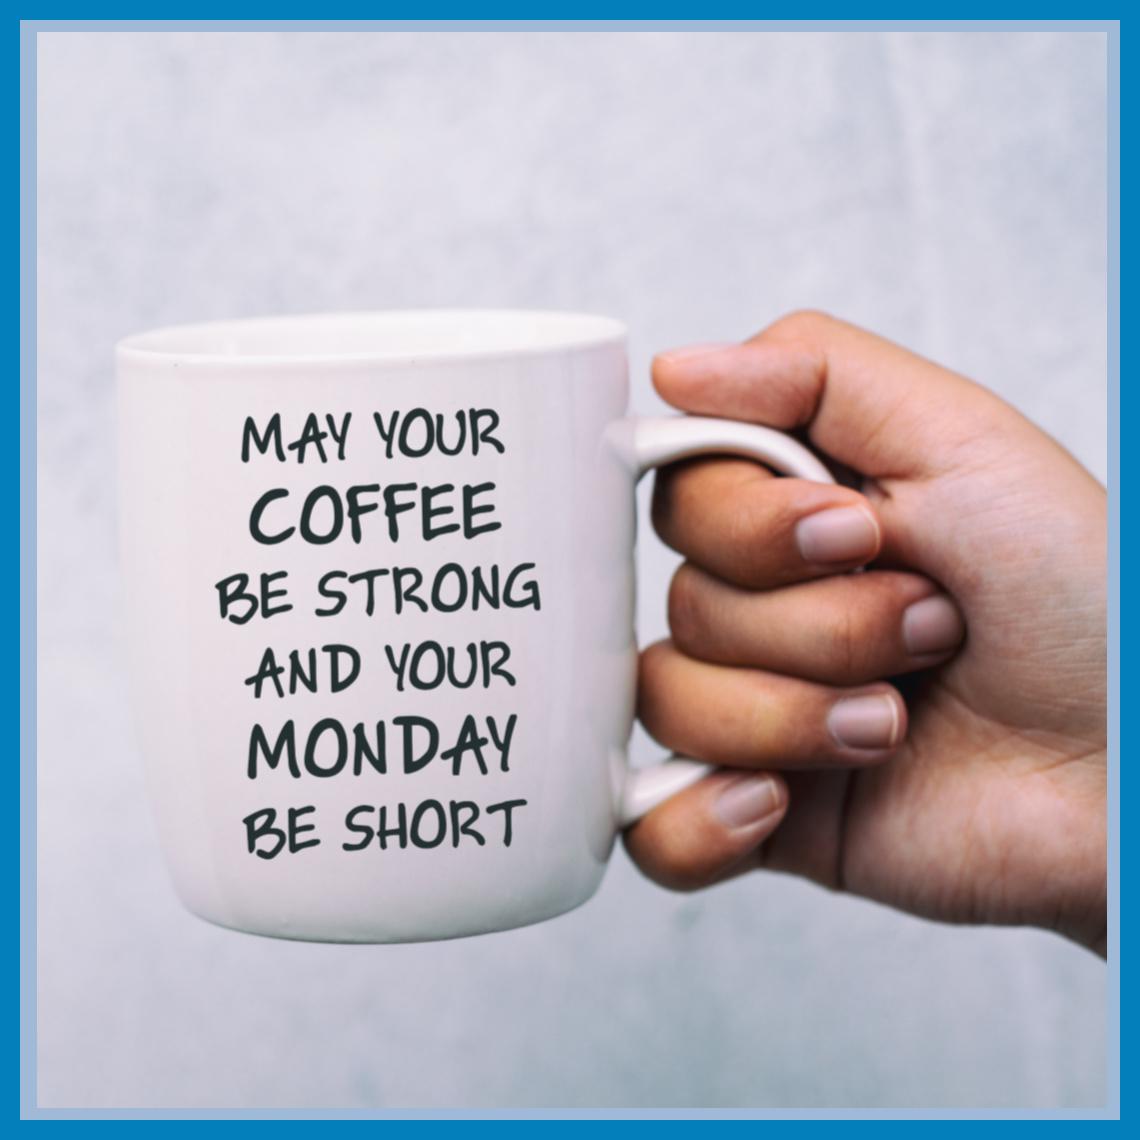 Happy Monday!!  #monday #happymonday #newweek #morningcoffee   #food #foodpost #eatstagram #localrestaurant #takeoutfood #foodiesofinstagram #foodphotography #goodeats #foodiegram #foodlover #foodlife #healthyeating #wheretoeat #greatfoodpic.twitter.com/bSydSygZLo